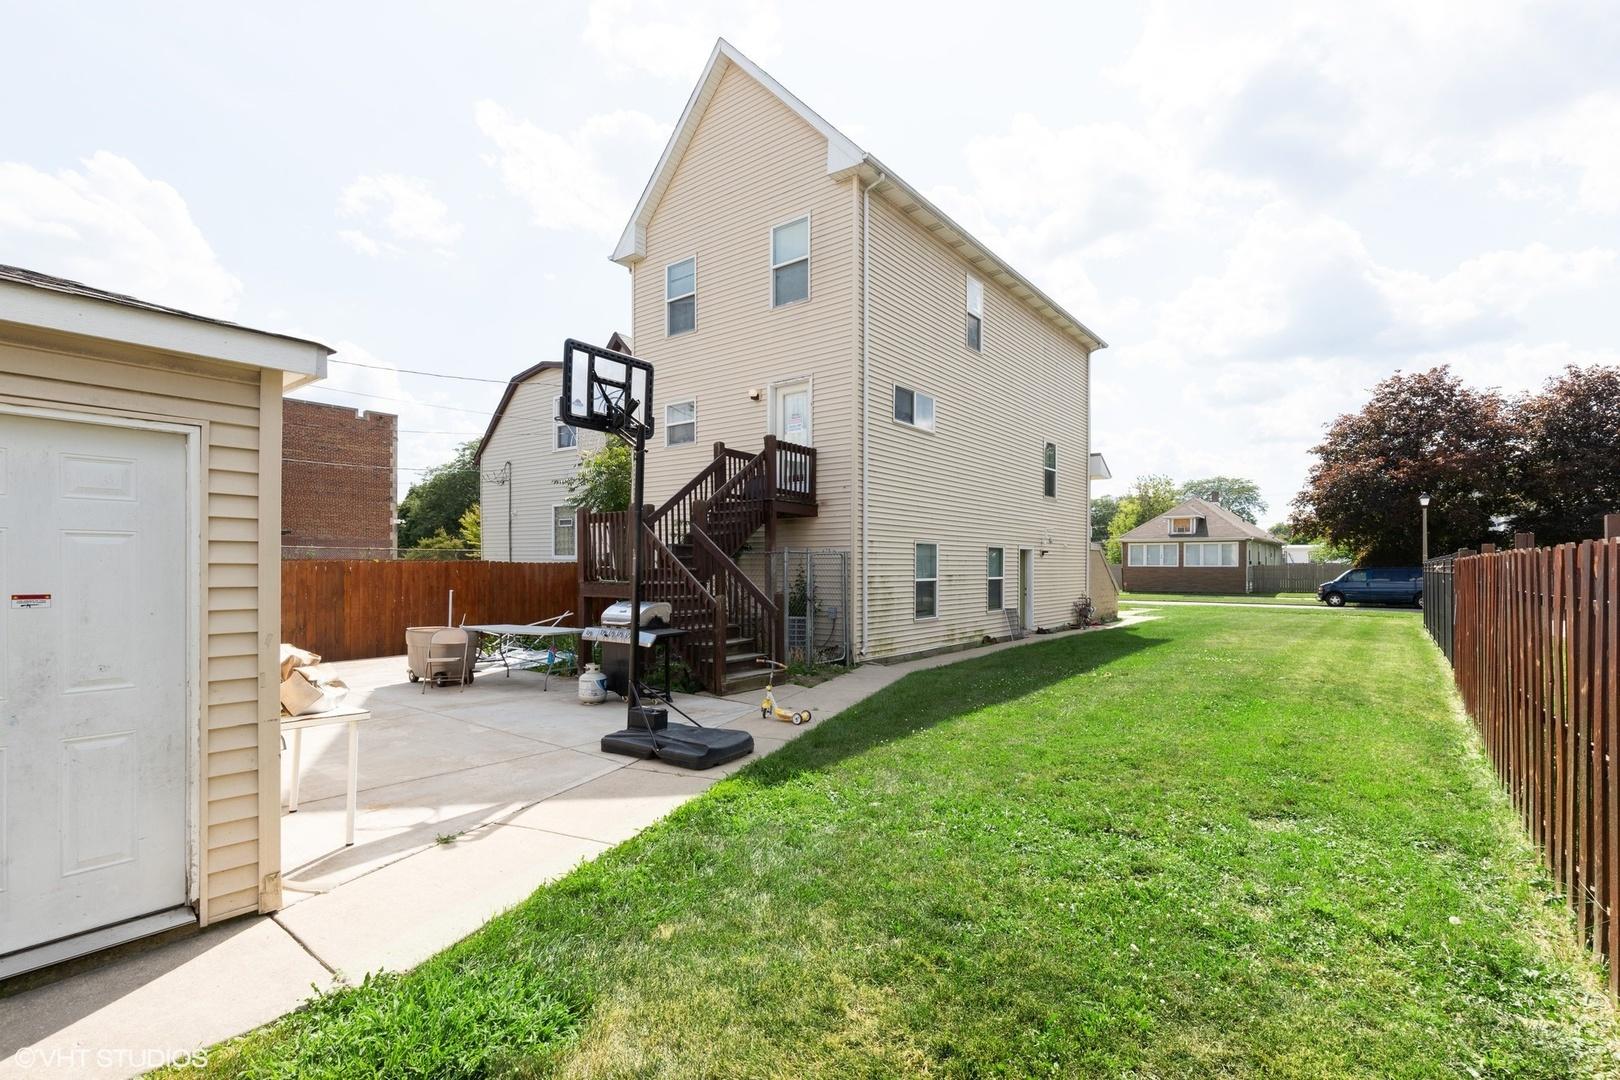 417 South 12TH, Maywood, Illinois, 60153